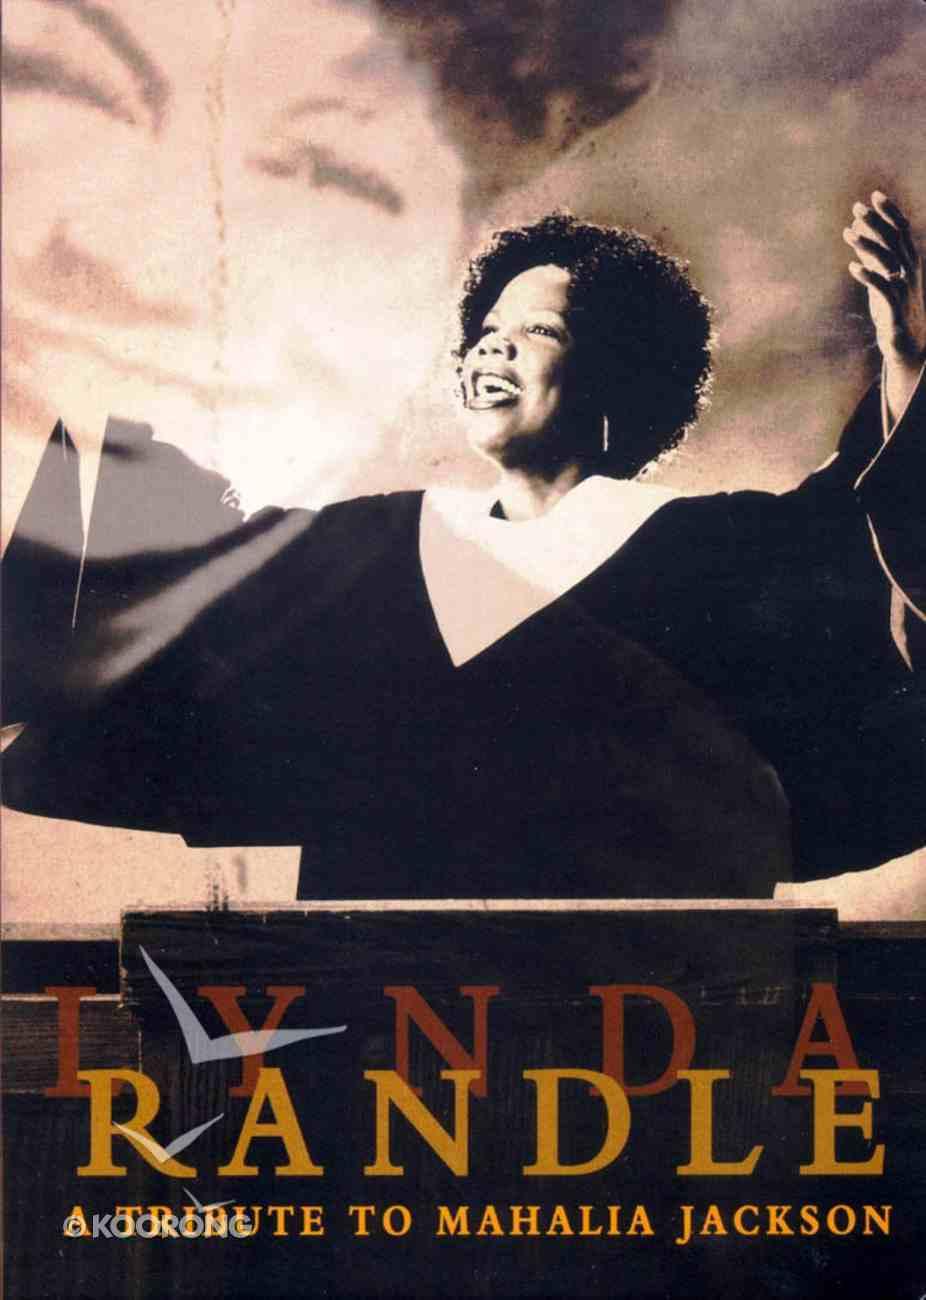 A Tribute to Mahalia Jackson DVD